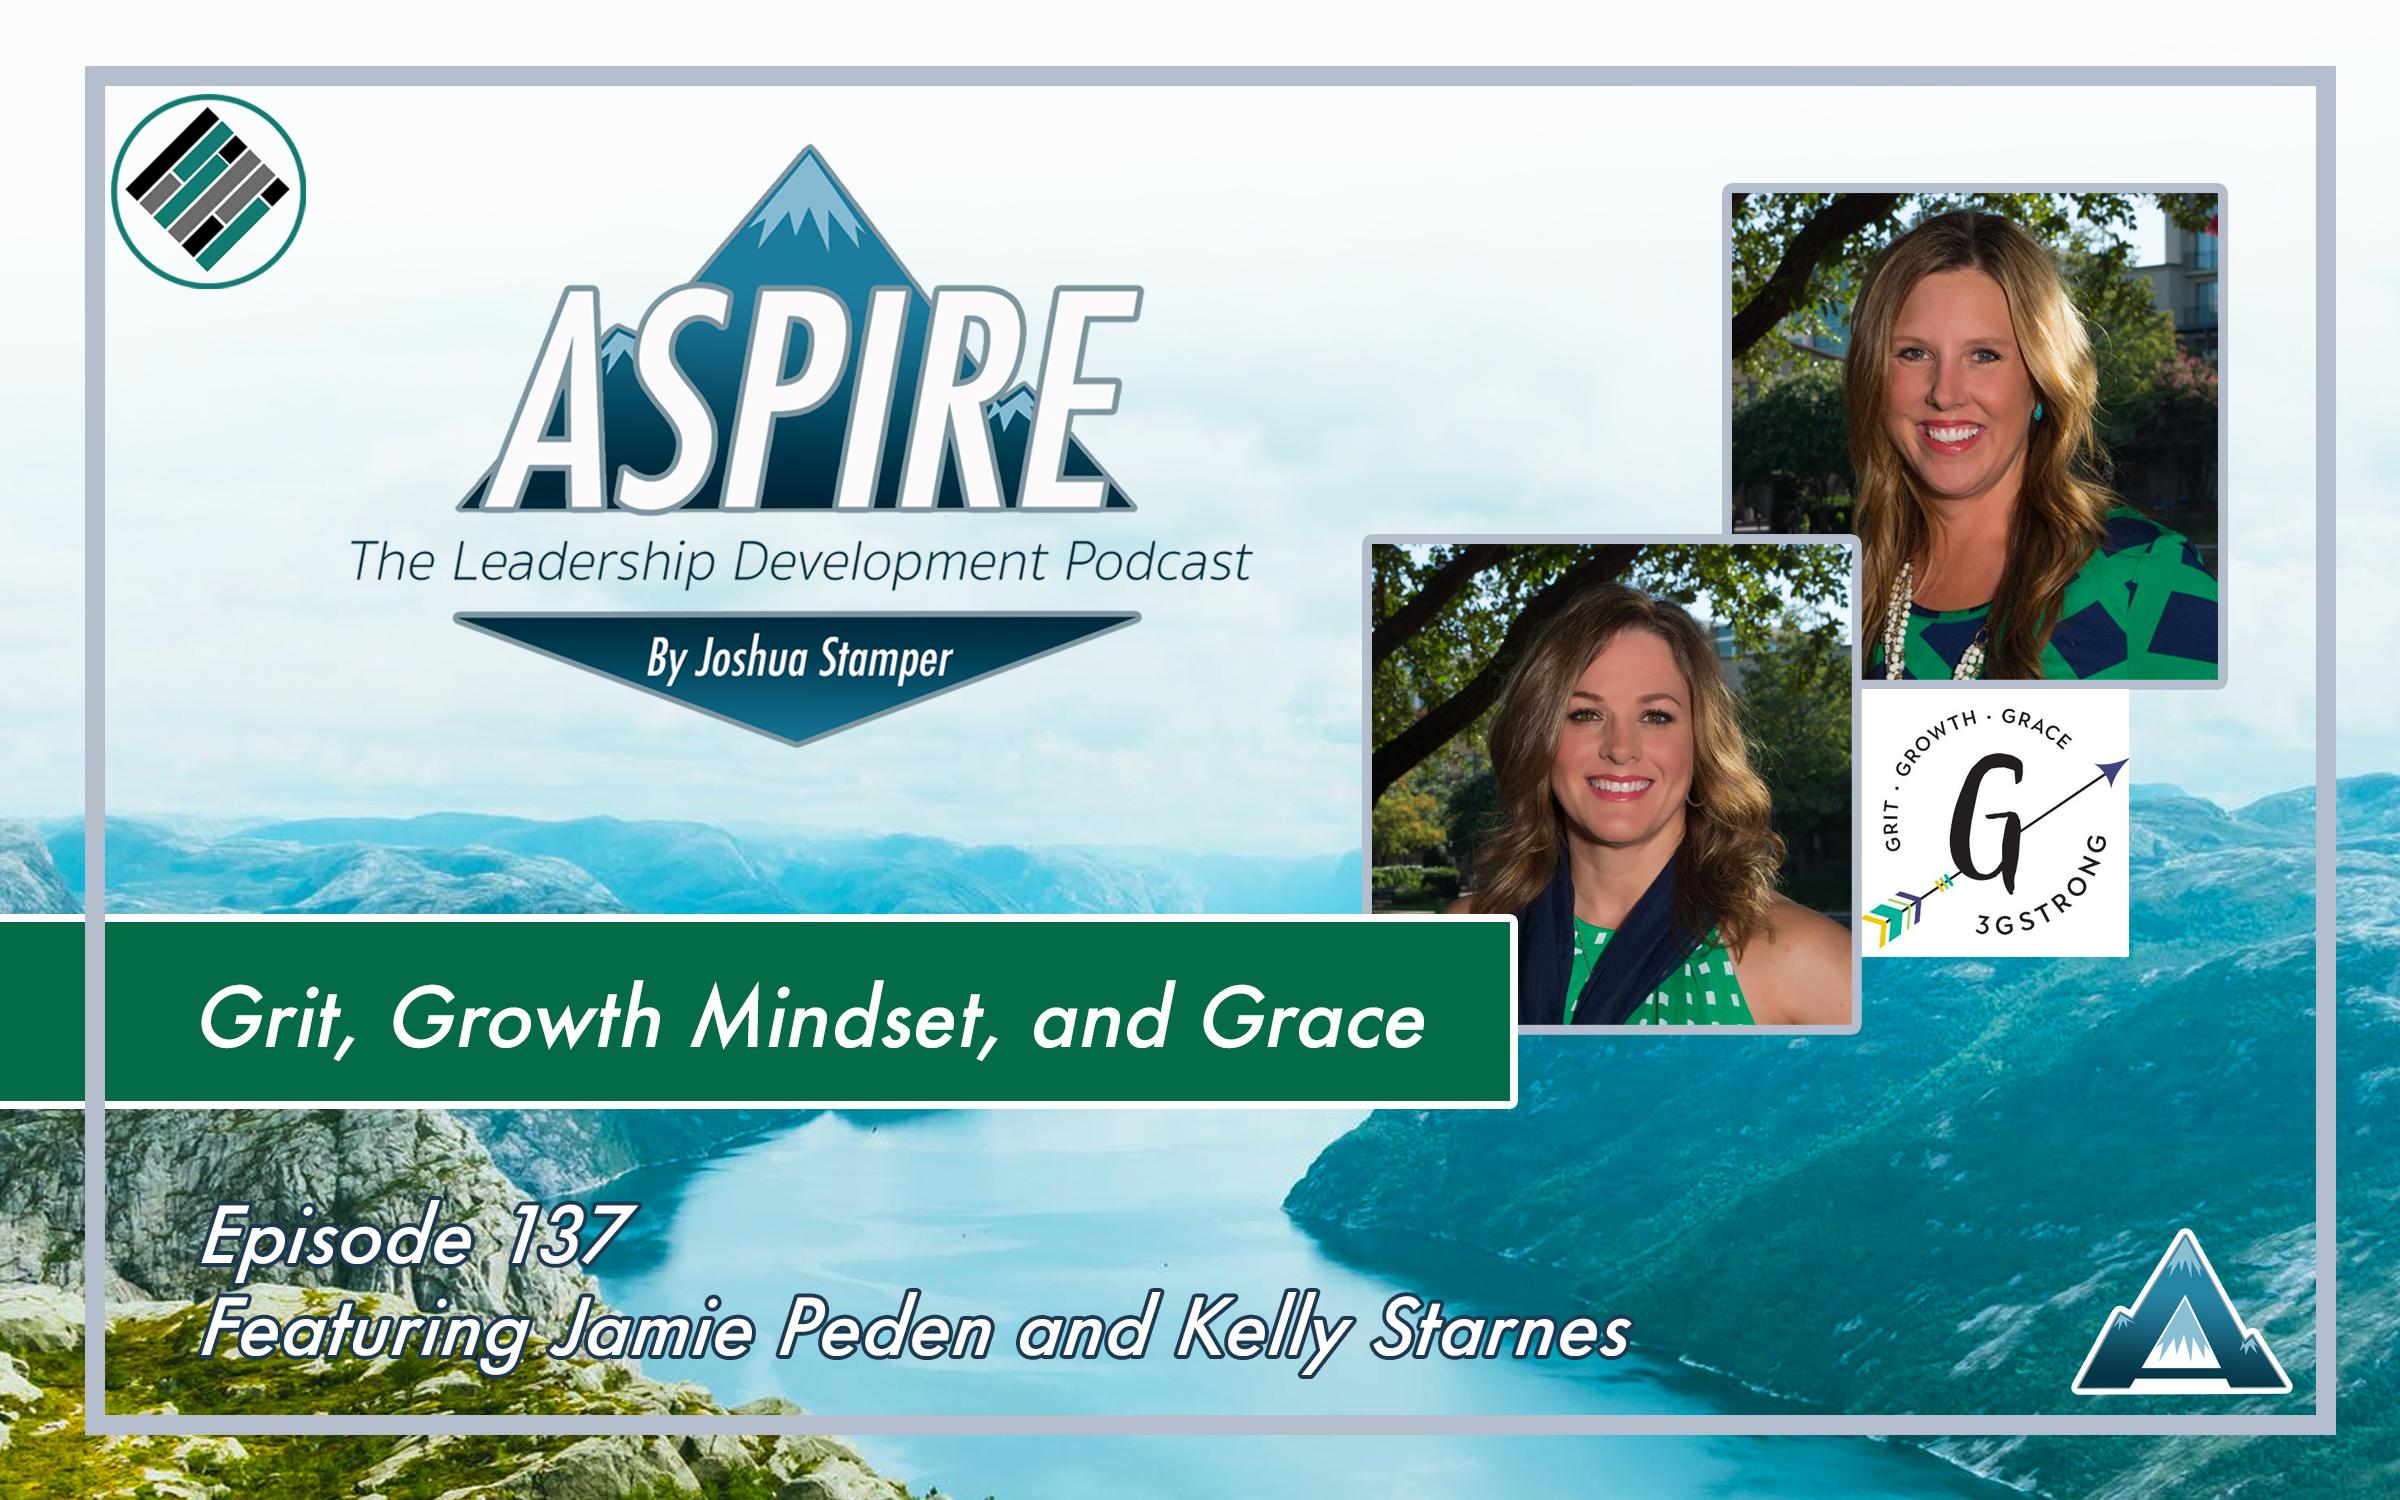 Joshua Stamper, Aspire: The Leadership Development Podcast, #AspireLead, 3gStrong, Jamie Peden, Kelly Starnes